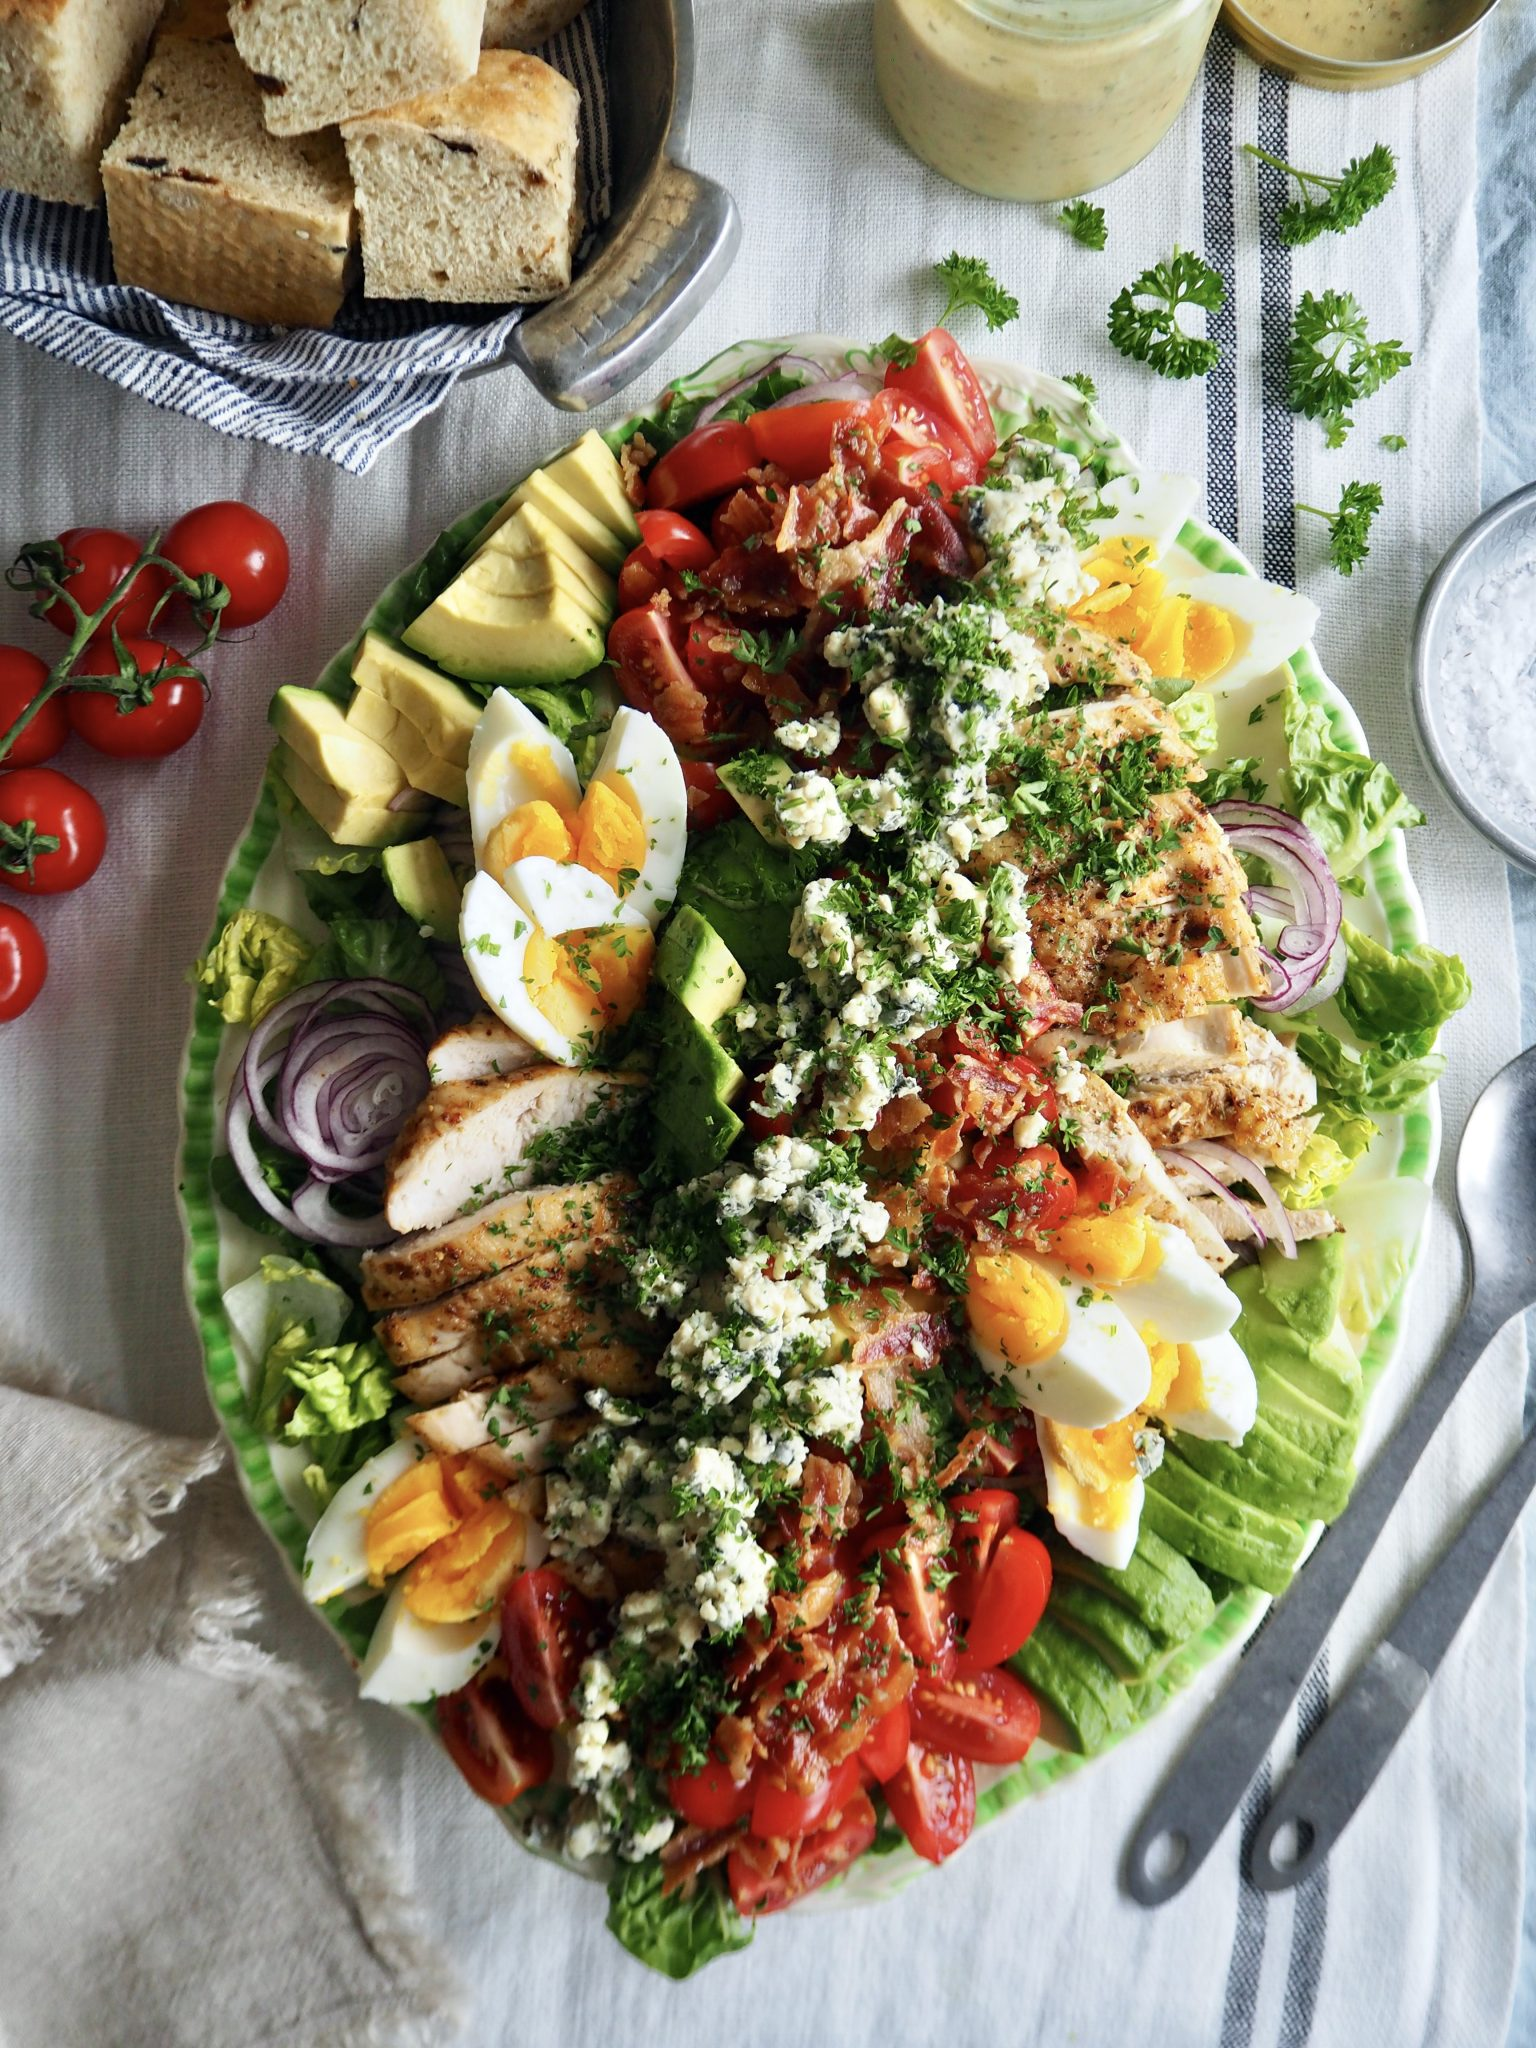 Cobb salad - en klassisk amerikansk salat med kylling, bacon og avokado